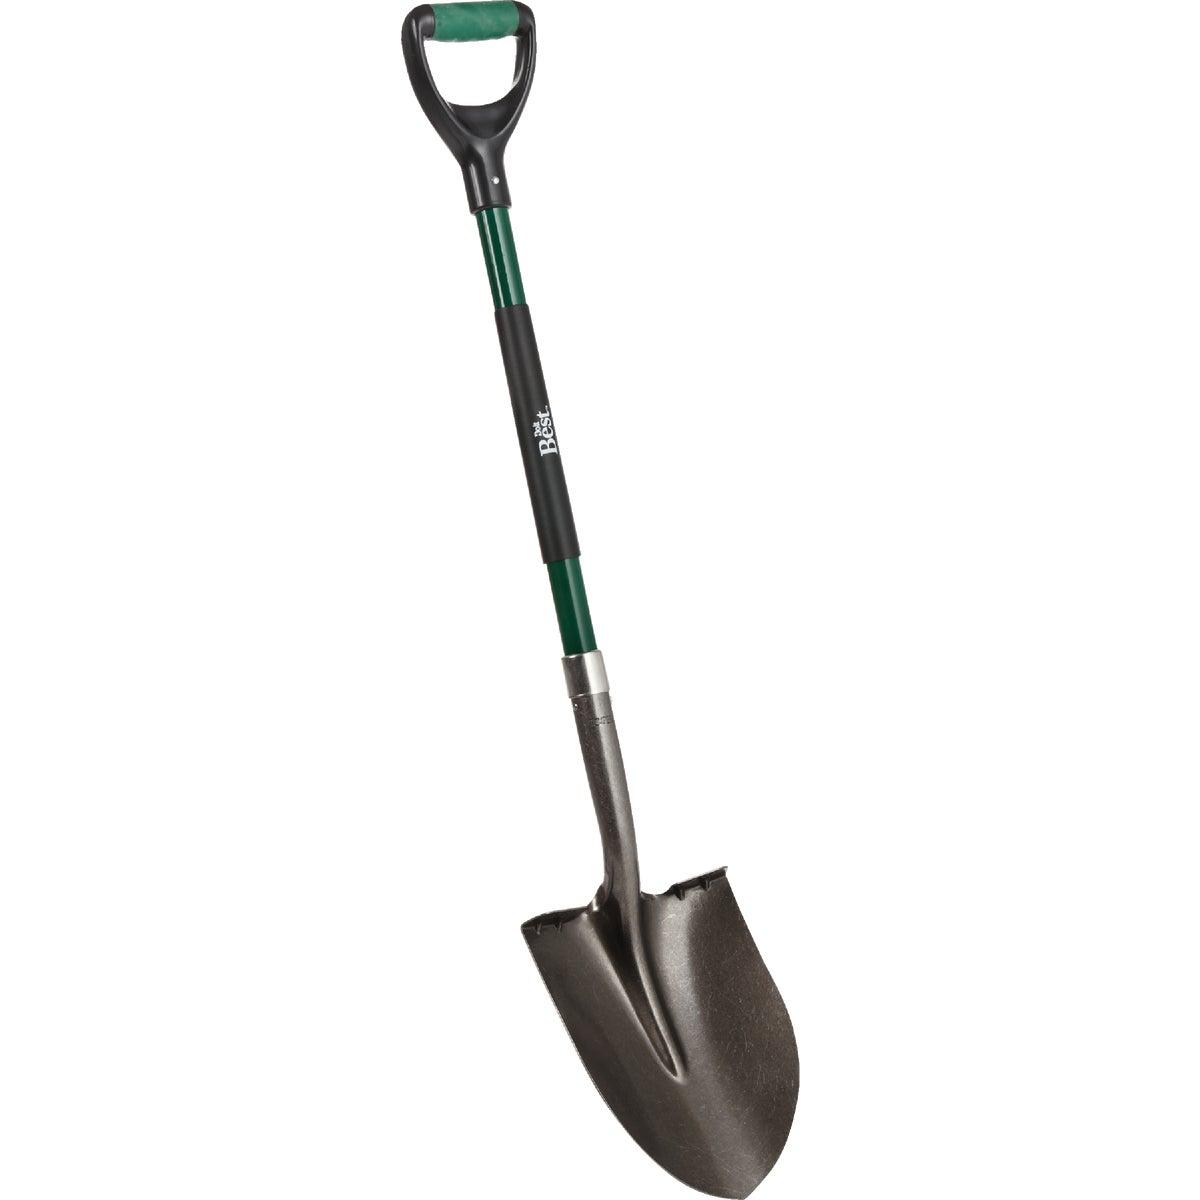 D-Hdl Round Pt Shovel